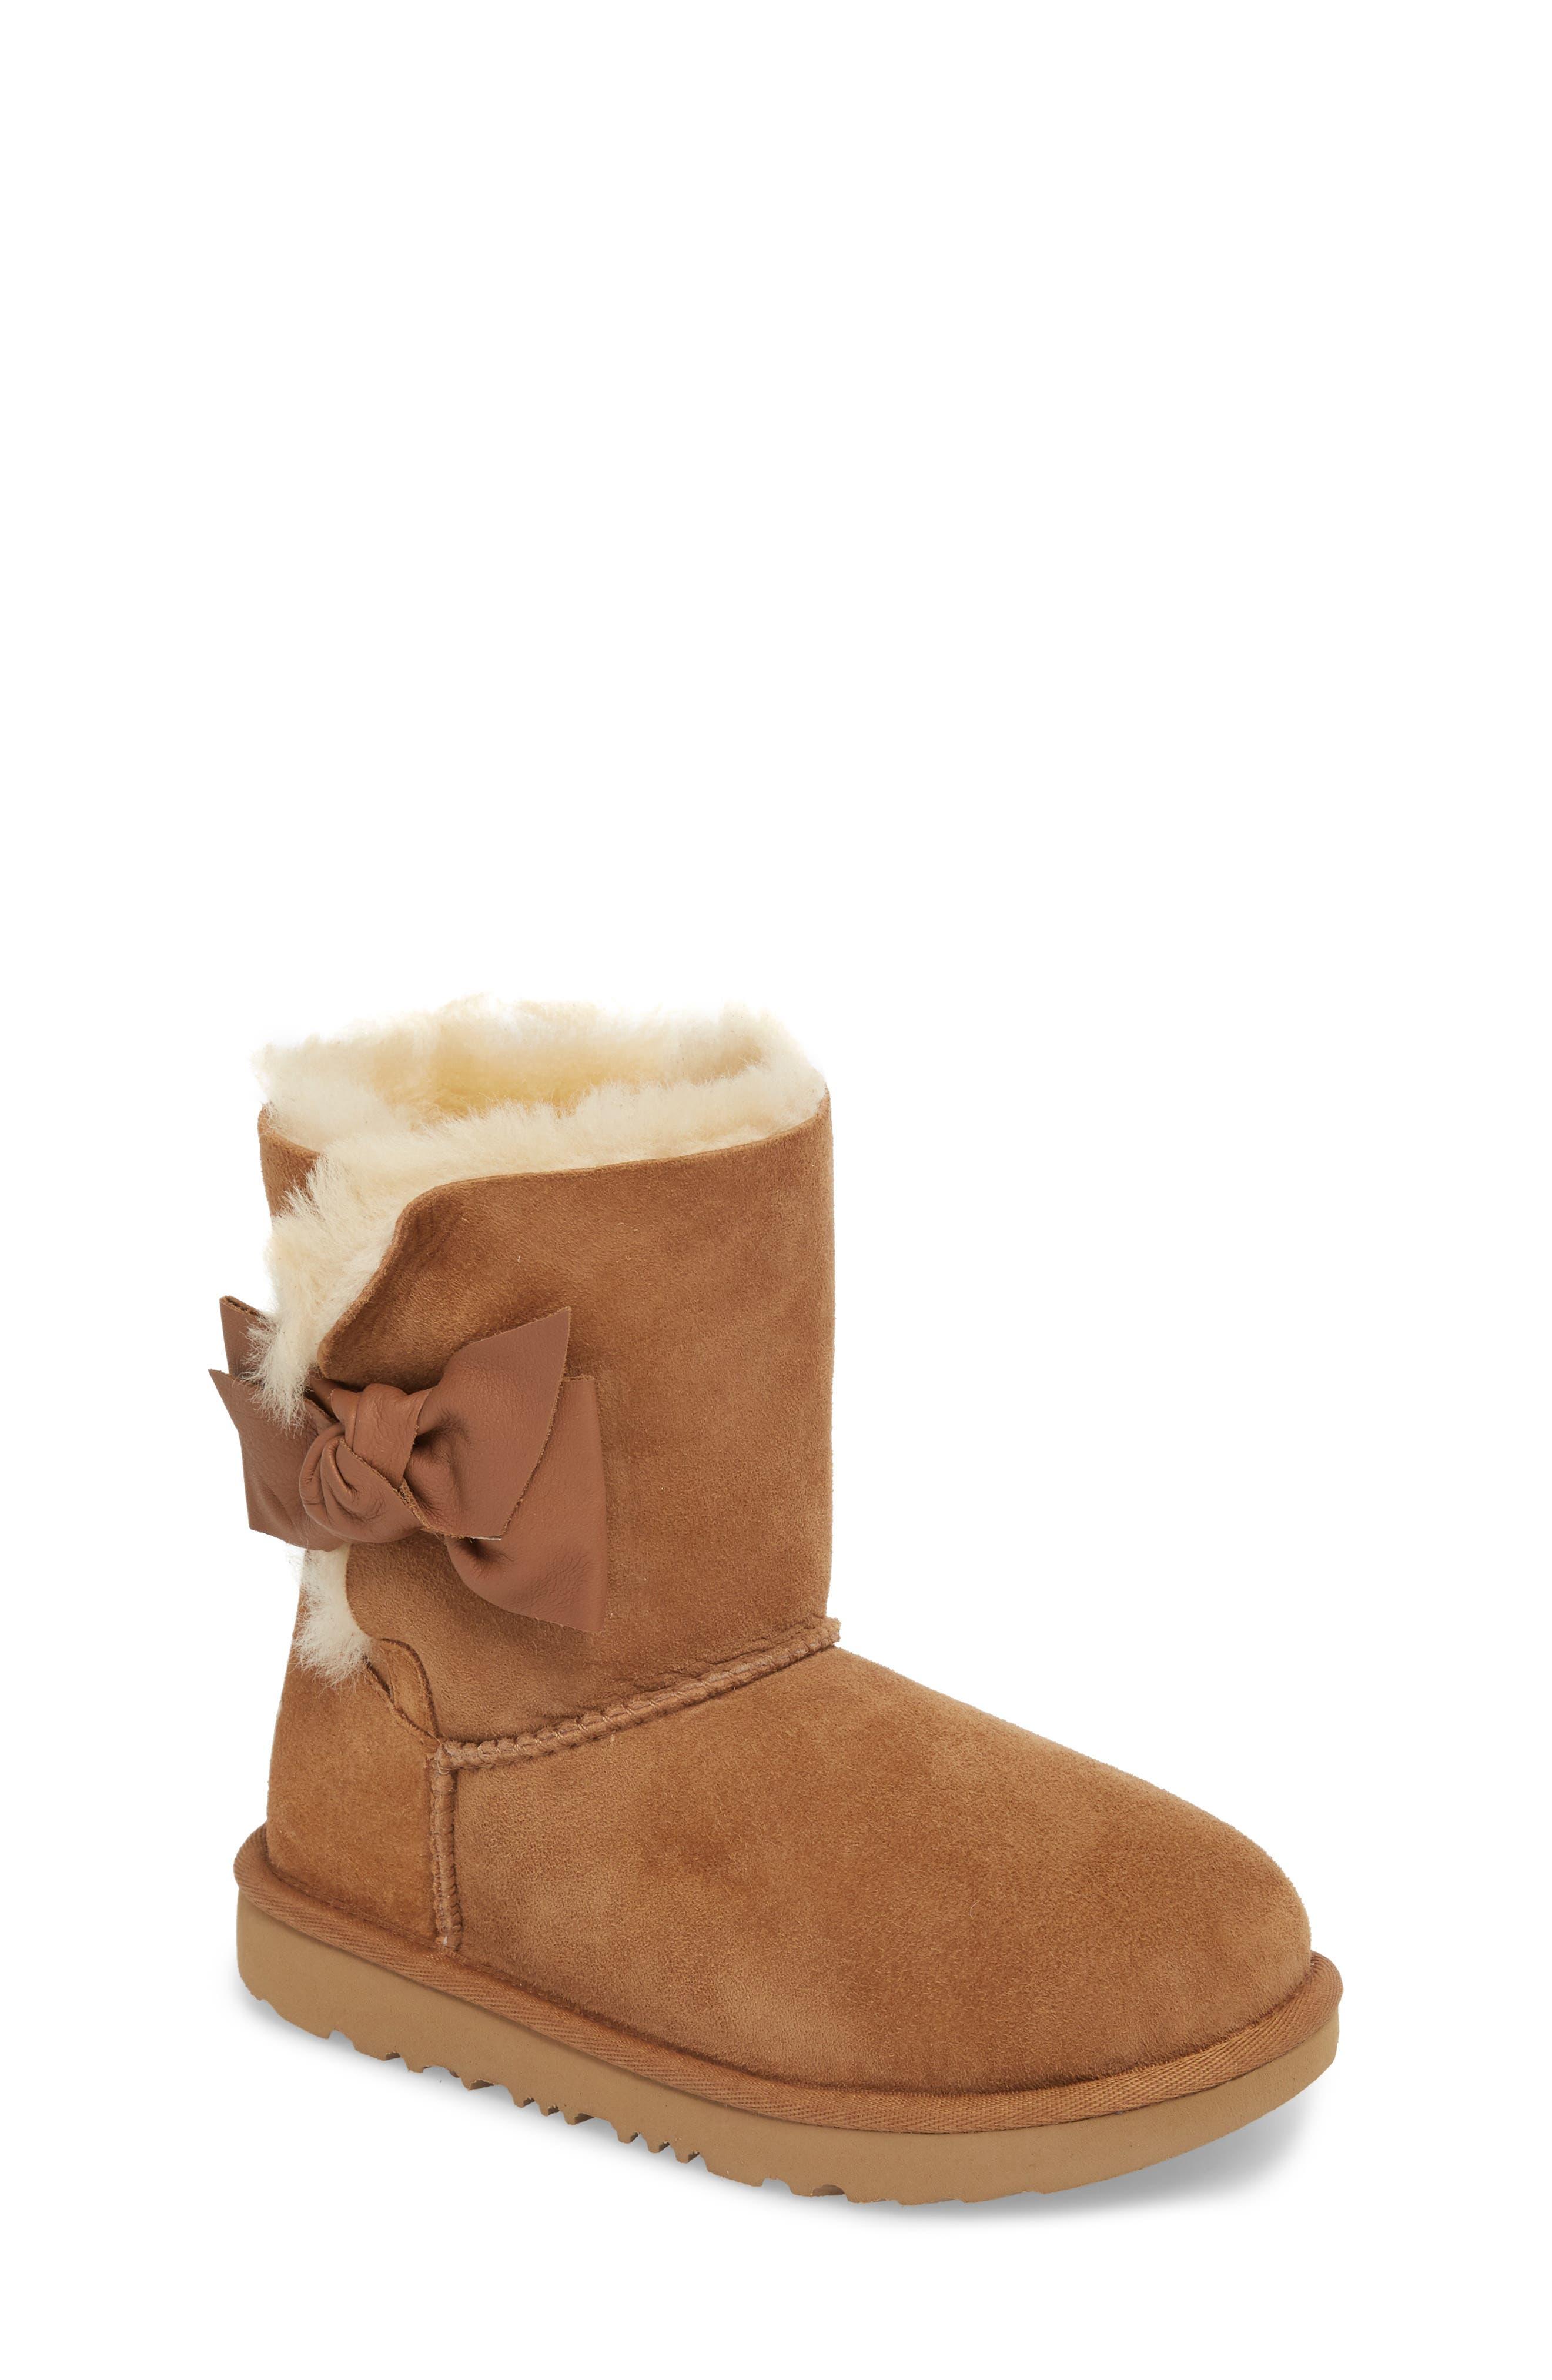 Daelynn Bow Genuine Shearling Boot,                             Main thumbnail 1, color,                             CHESTNUT